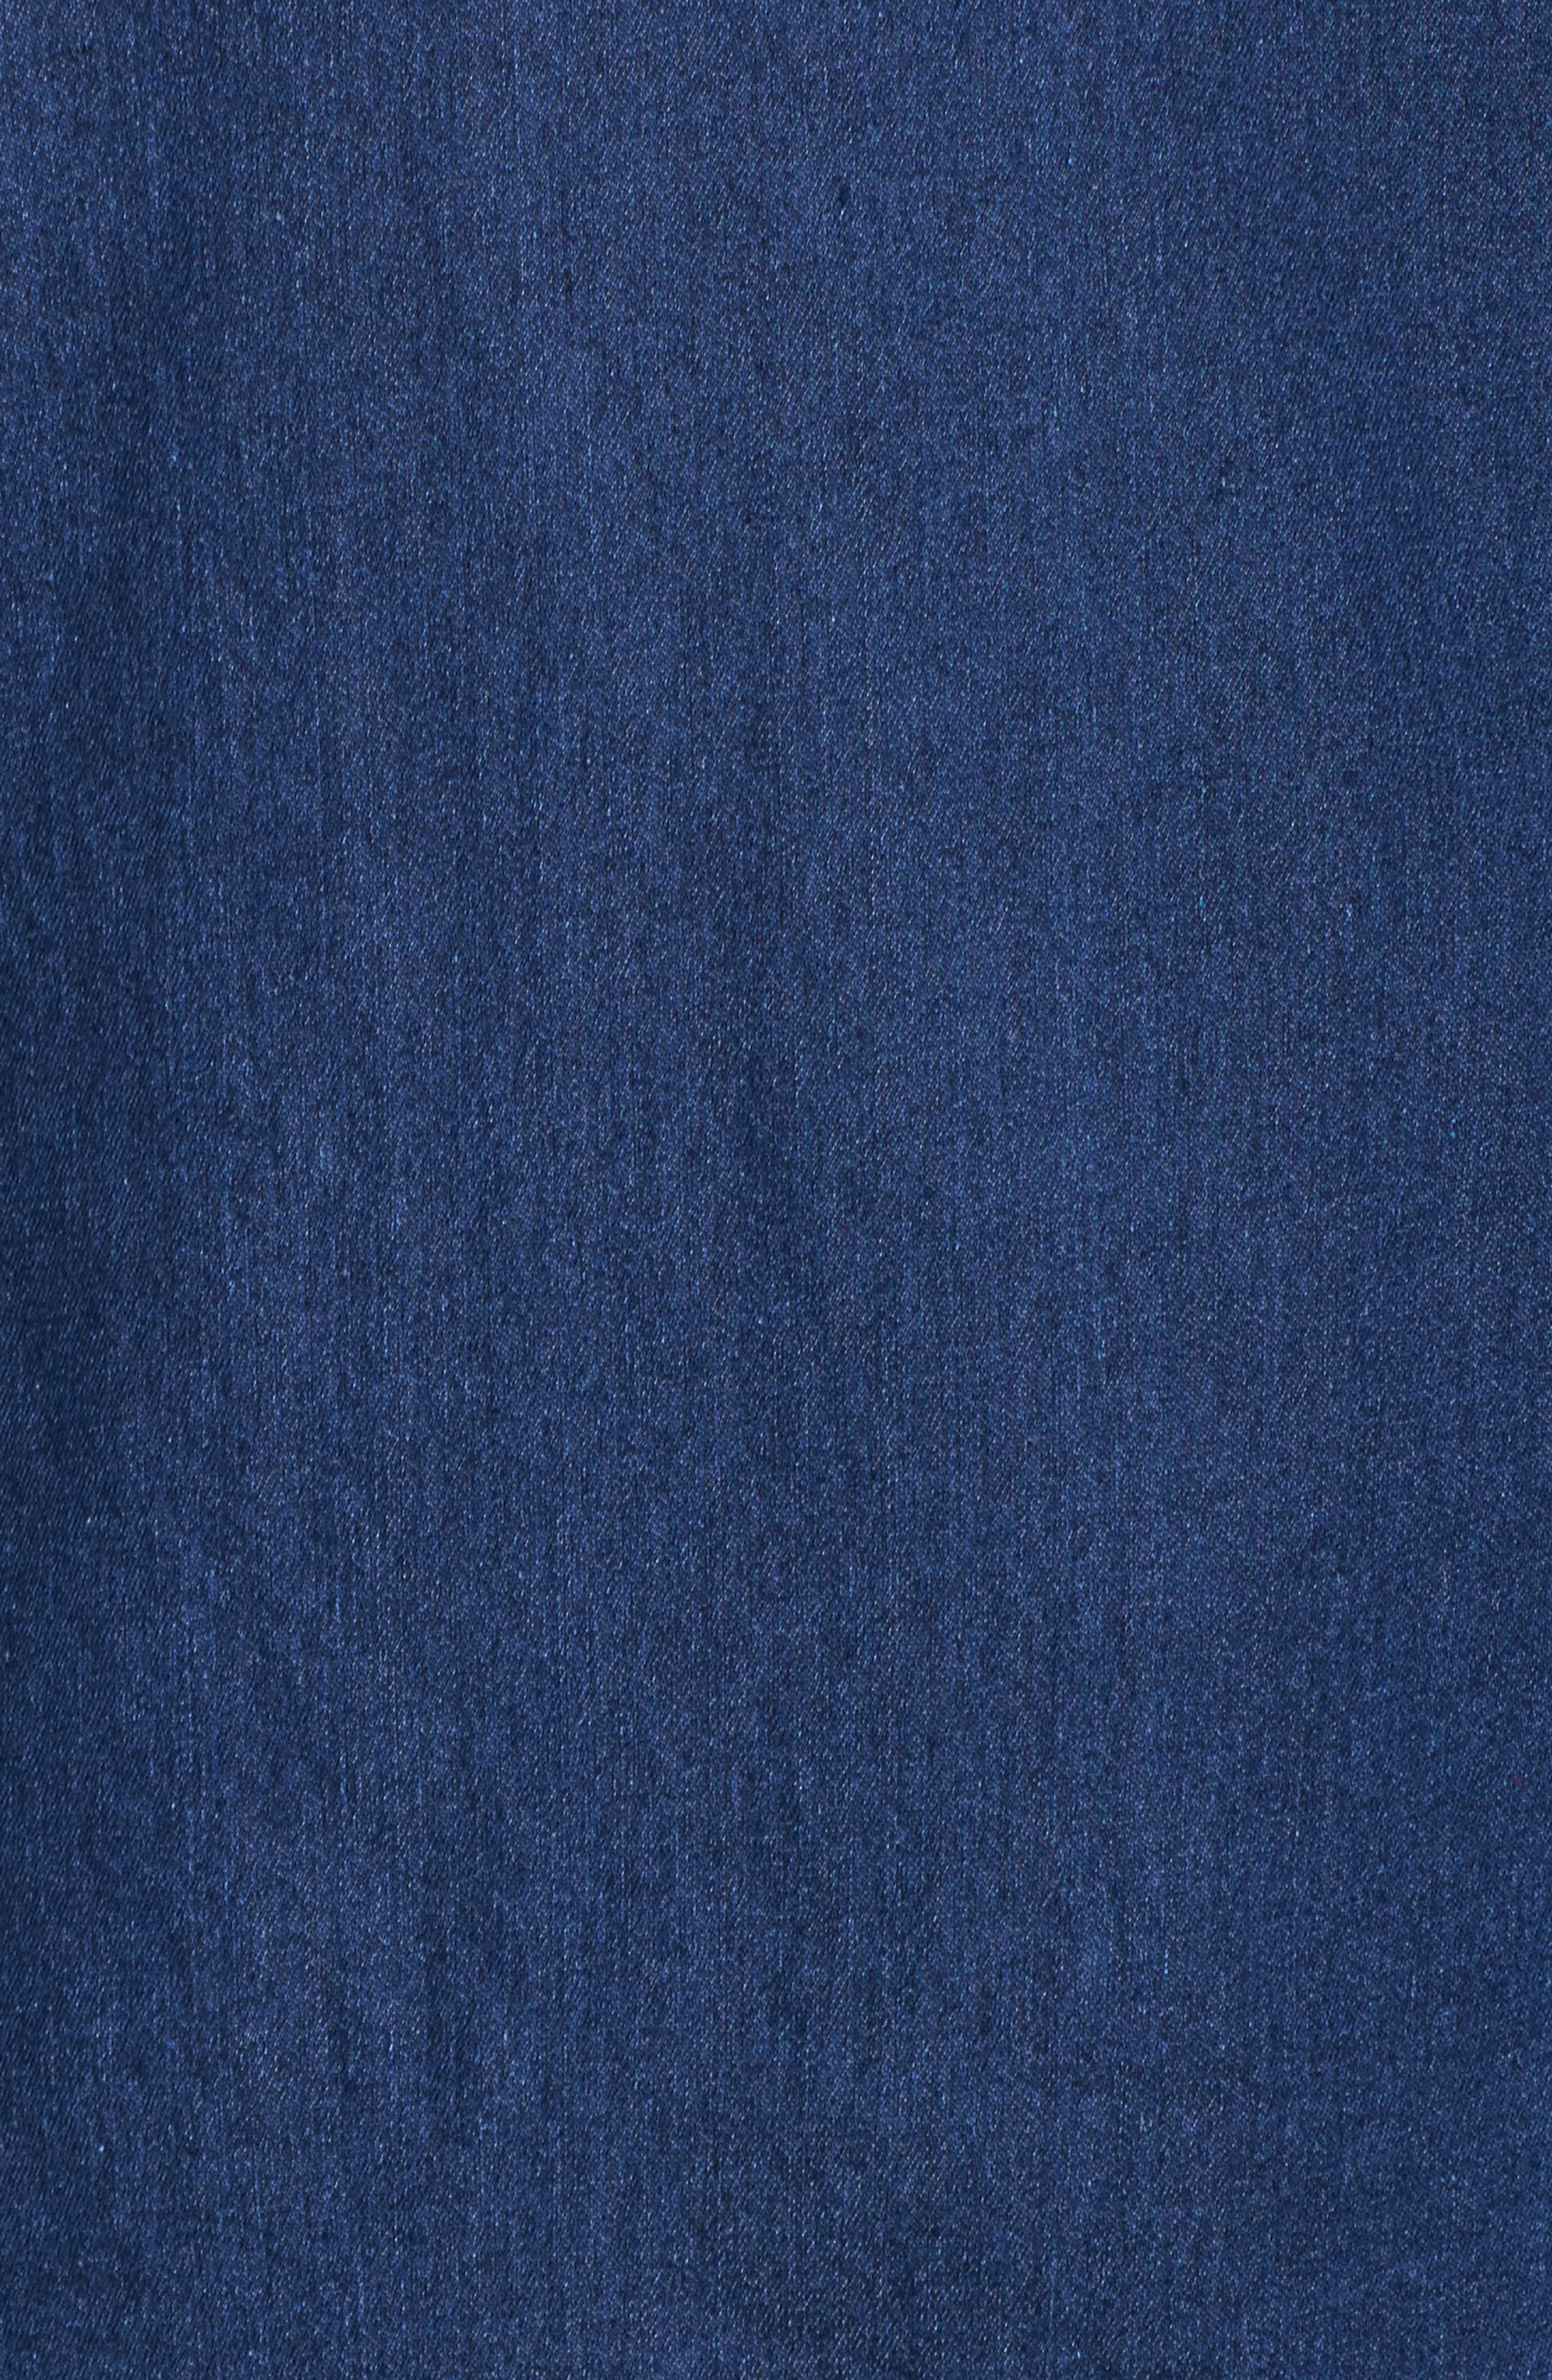 Blouson Sleeve Denim Top,                             Alternate thumbnail 5, color,                             Mid Denim